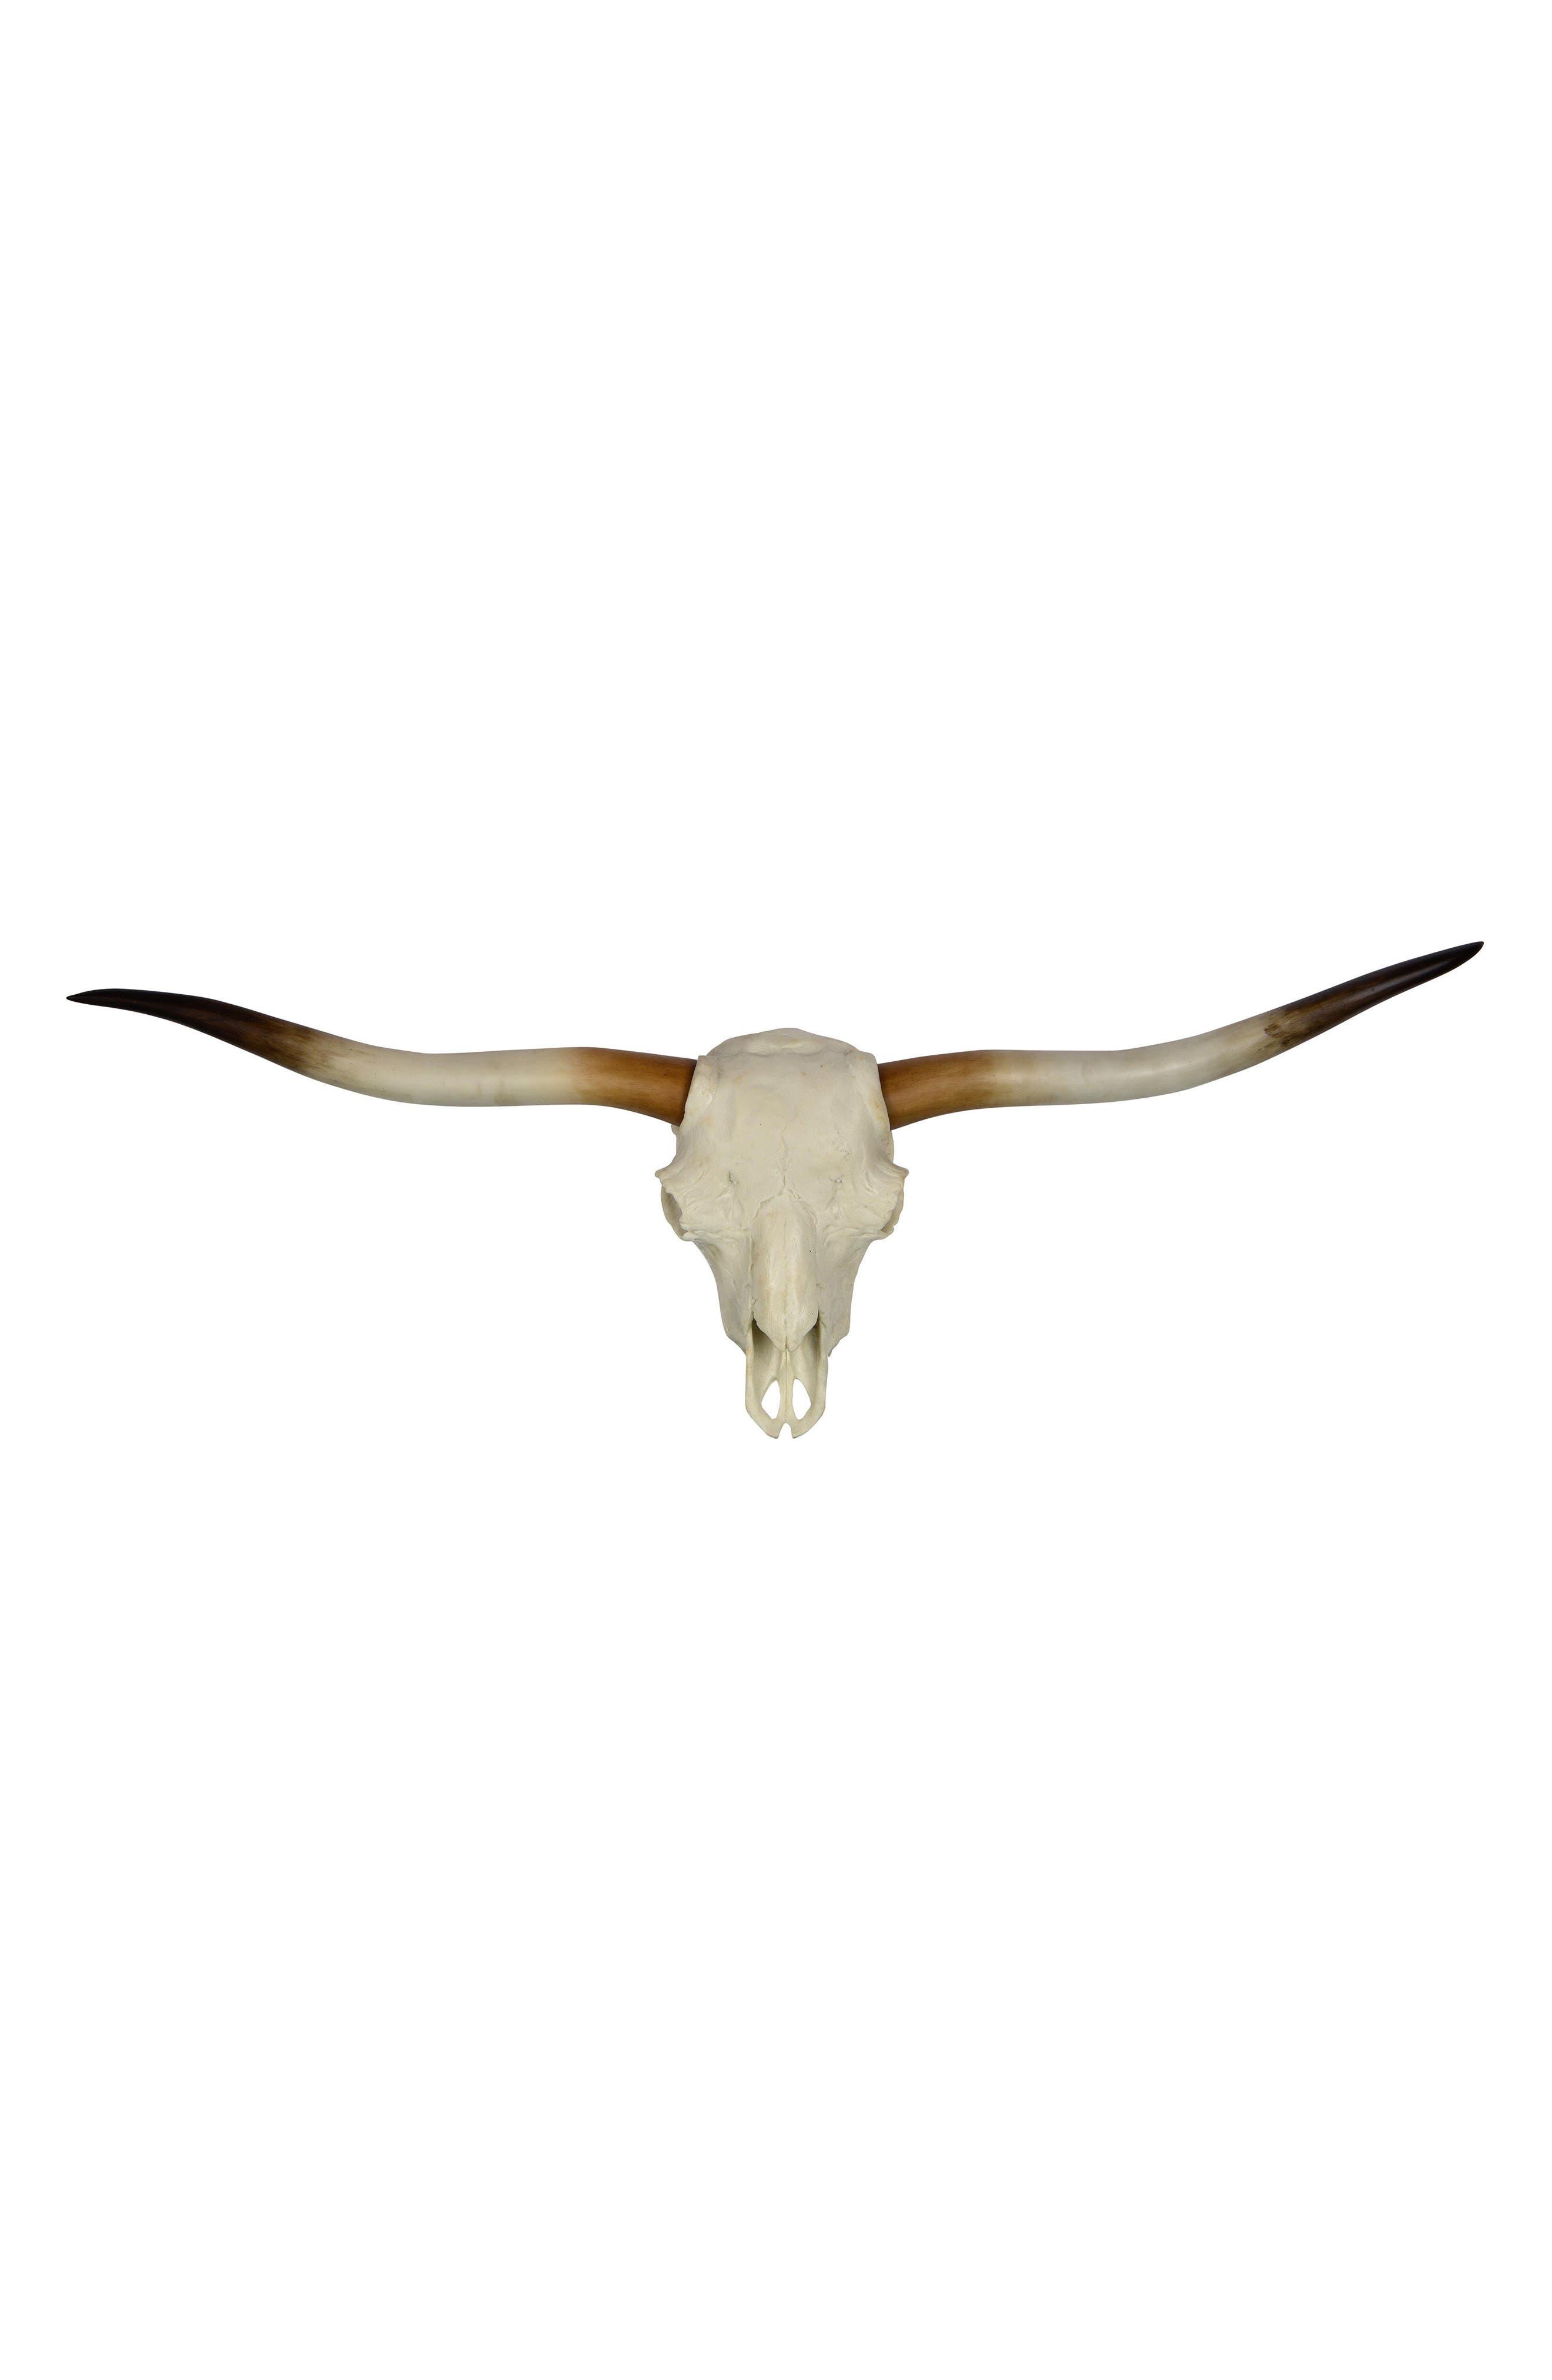 Main Image - Renwil Resin Longhorn Skull Wall Ornament